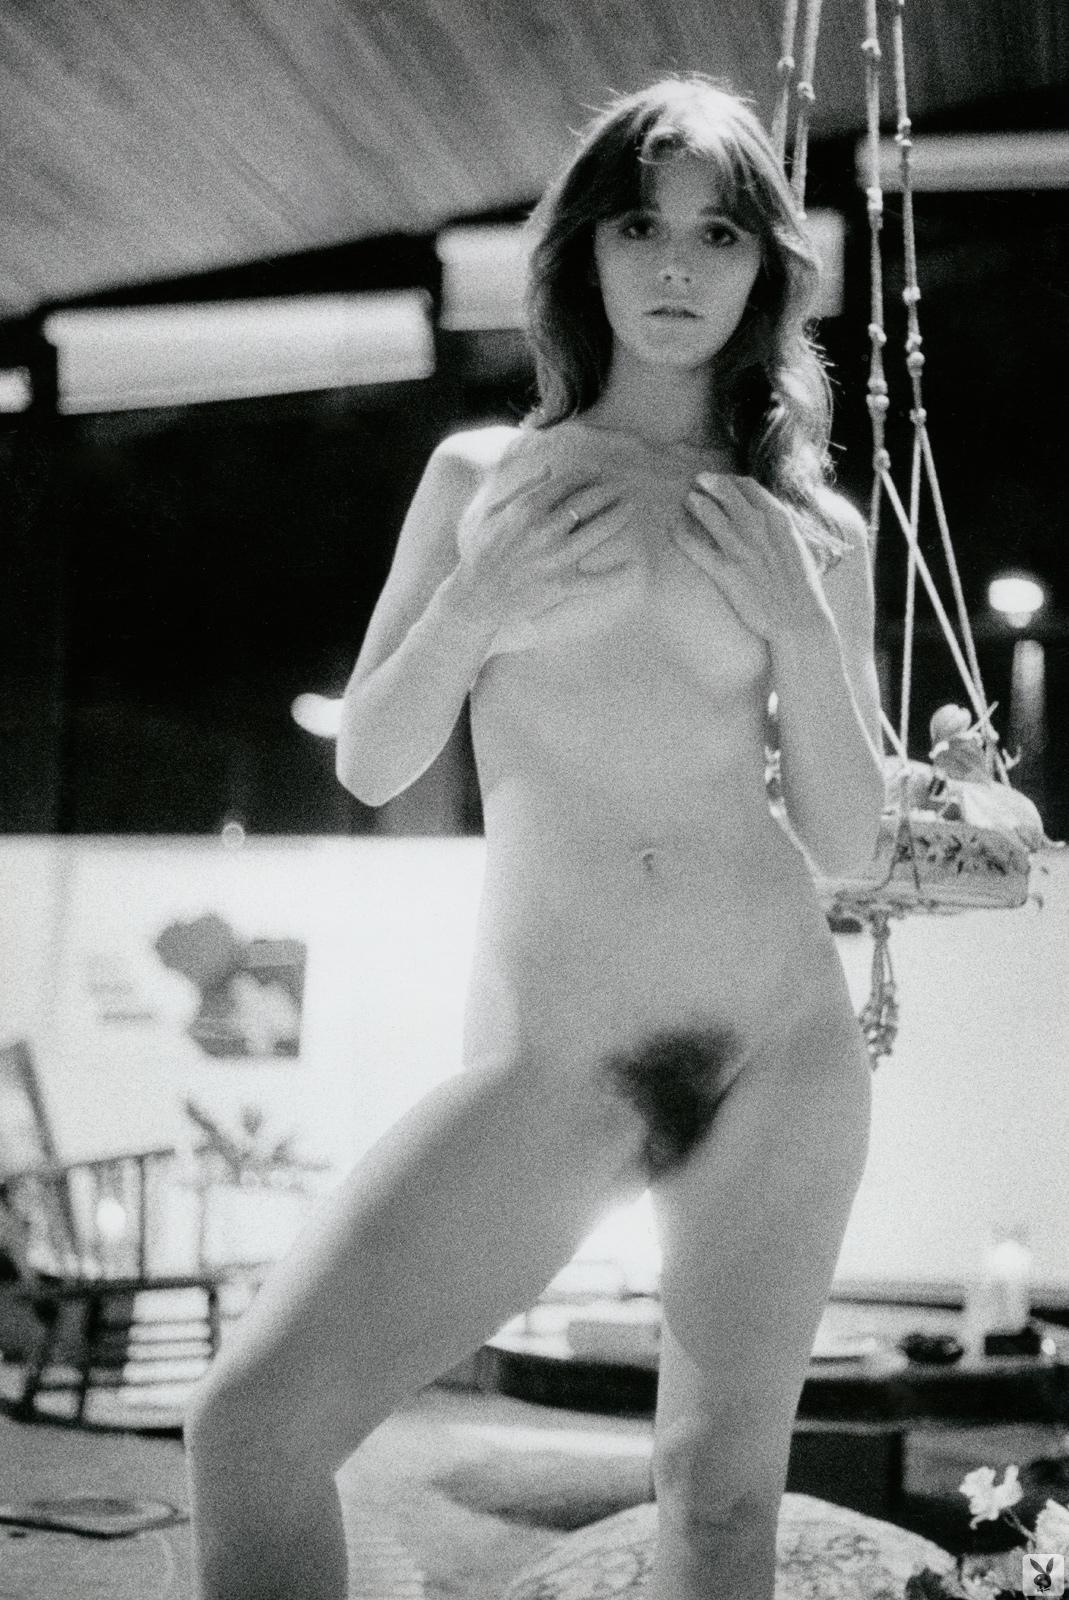 Margot Kidder Desnuda Página 2 Fotos Desnuda Descuido Topless